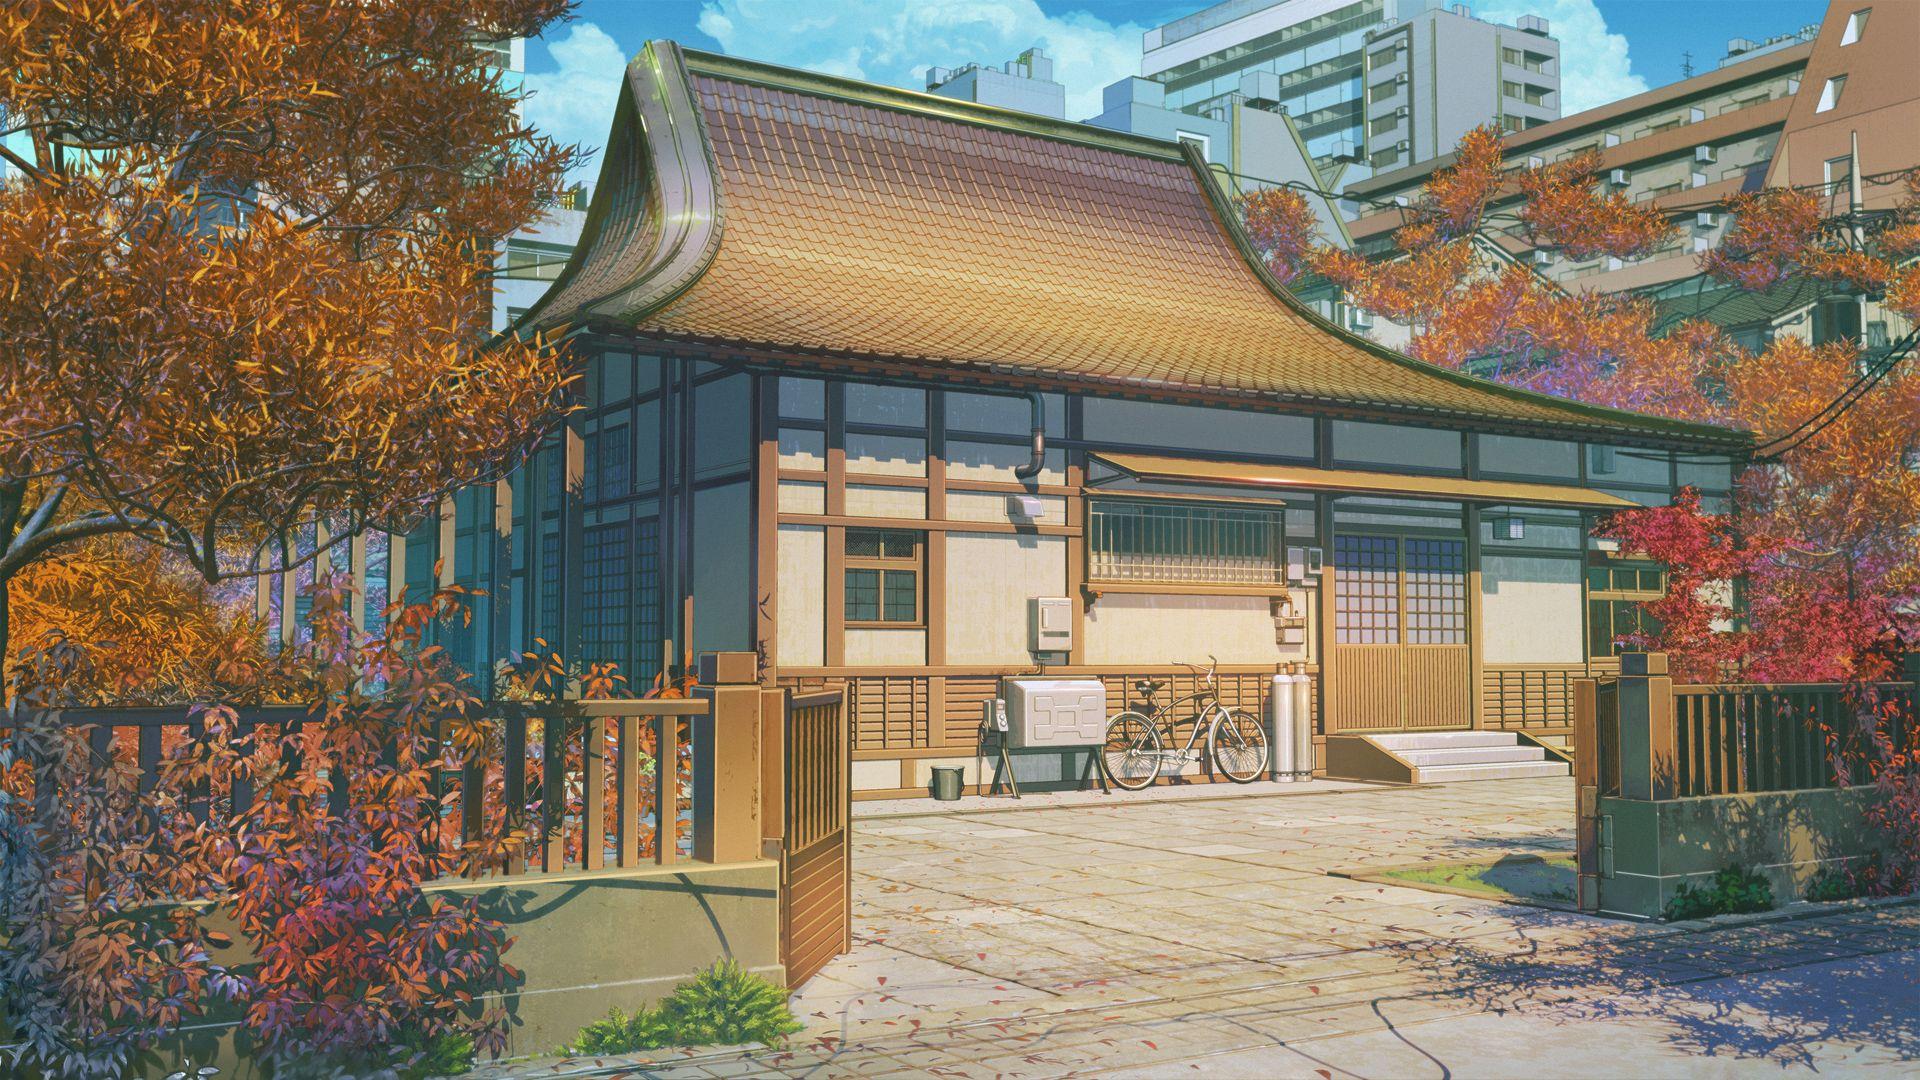 Old House Original Art By Arsenixc 1920x1080 Anime Scenery Wallpaper Japanese Mansion Anime Scenery